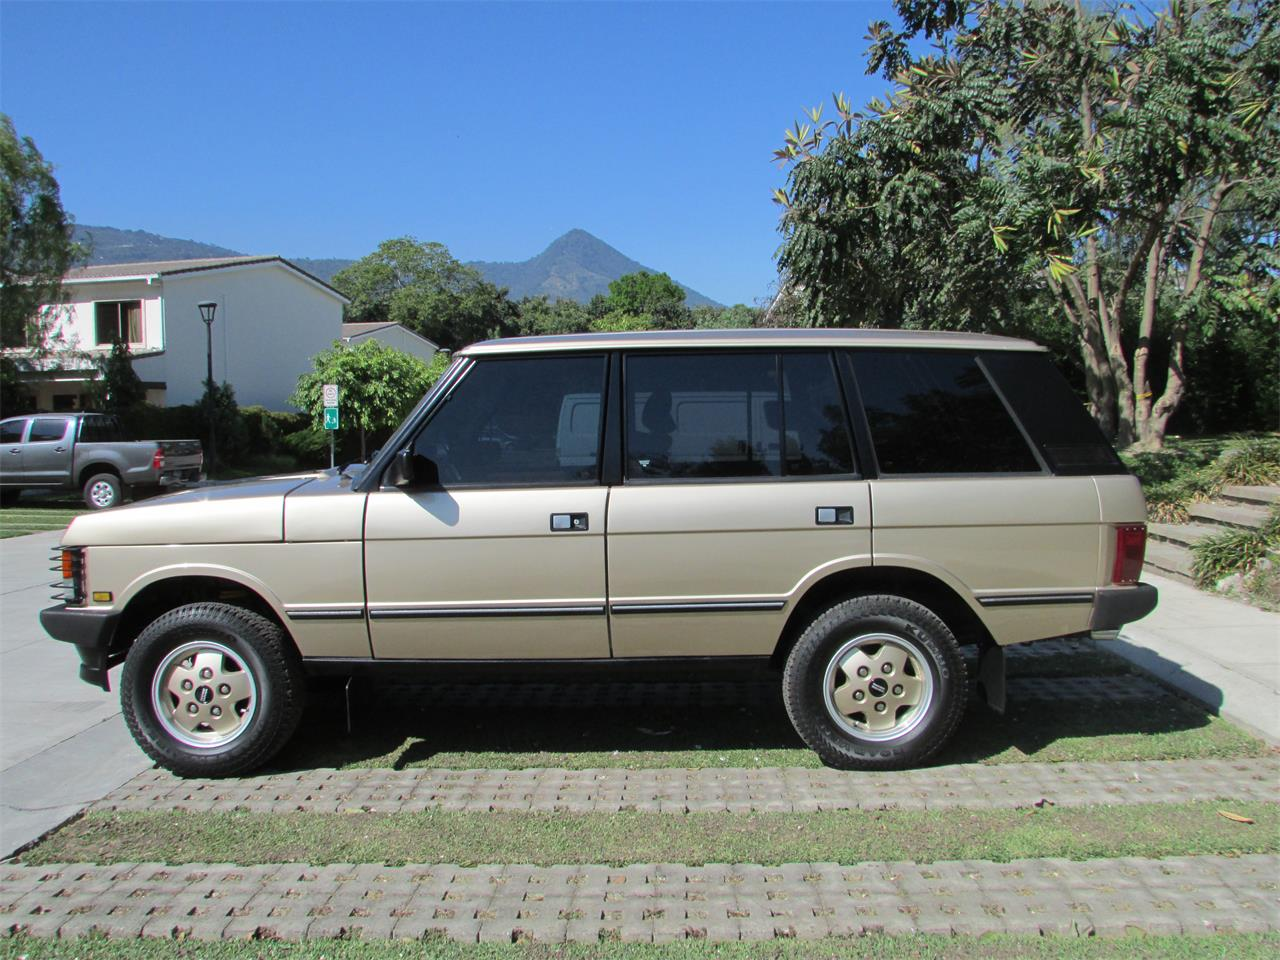 Land Rovers For Sale >> For Sale 1993 Land Rover Range Rover In San Salvador San Salvador